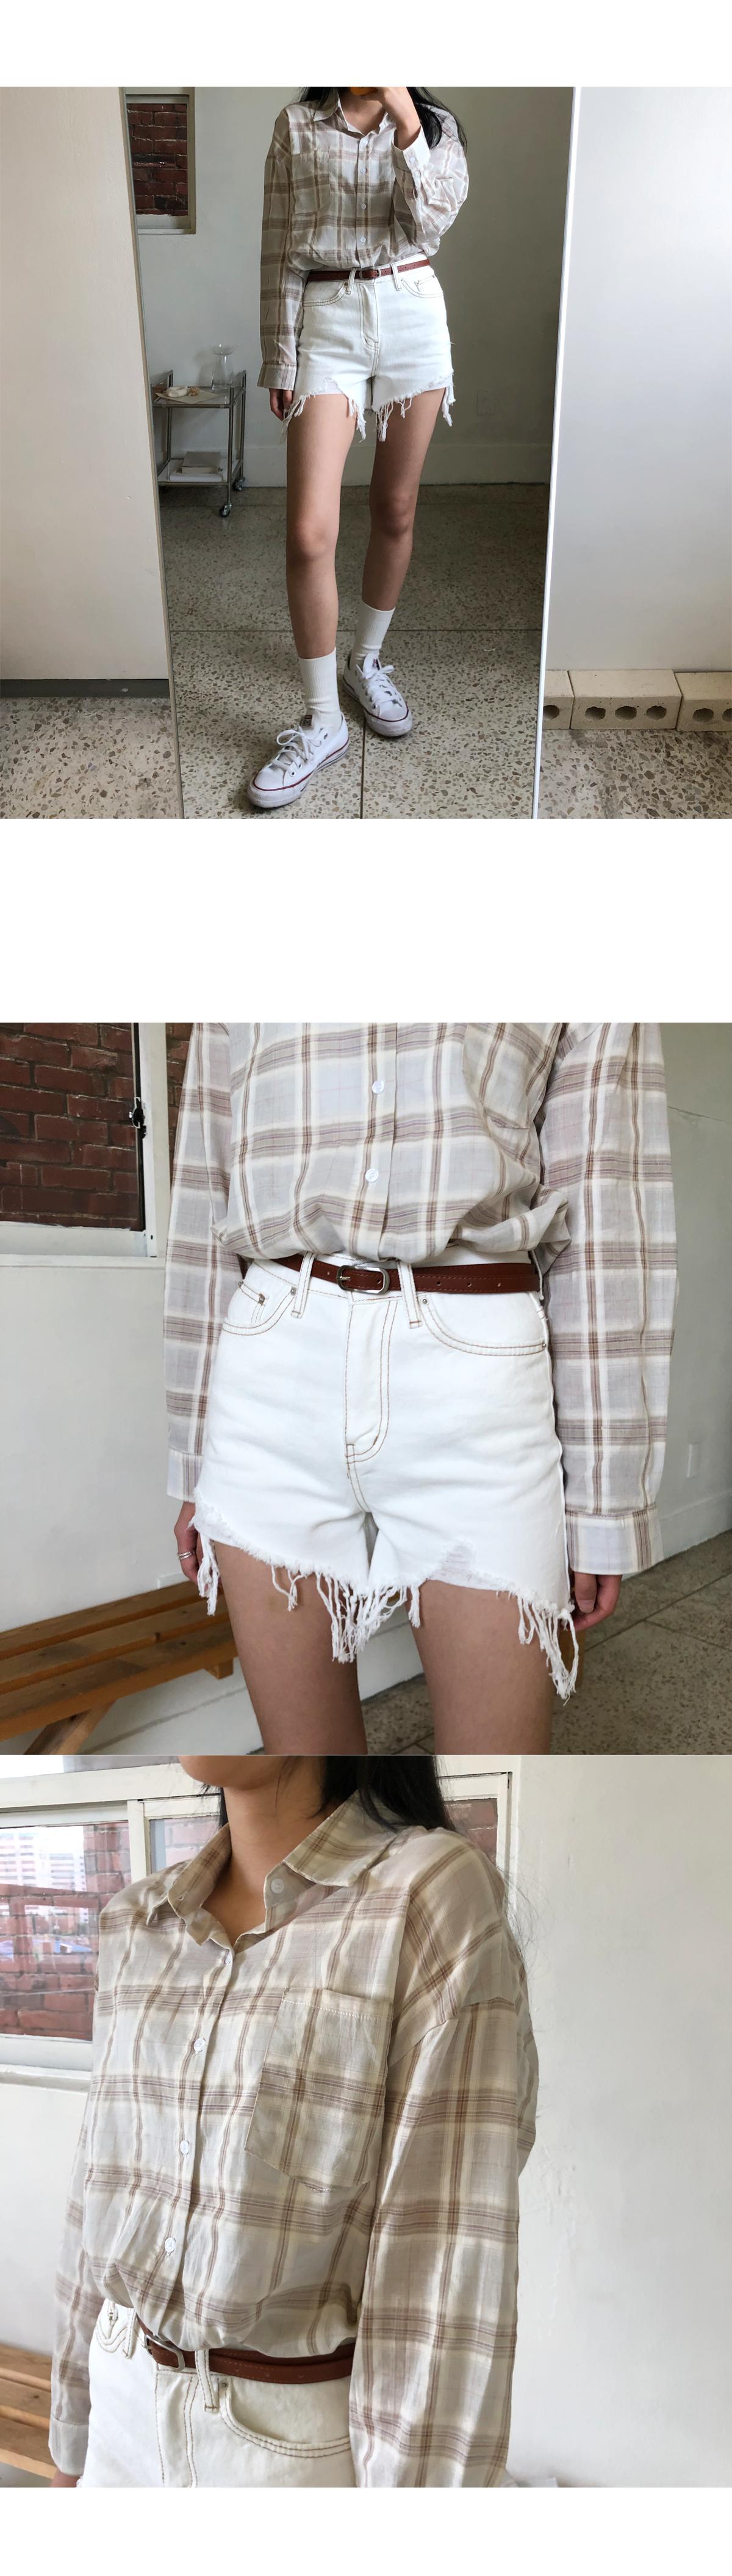 Bianca White Shorts